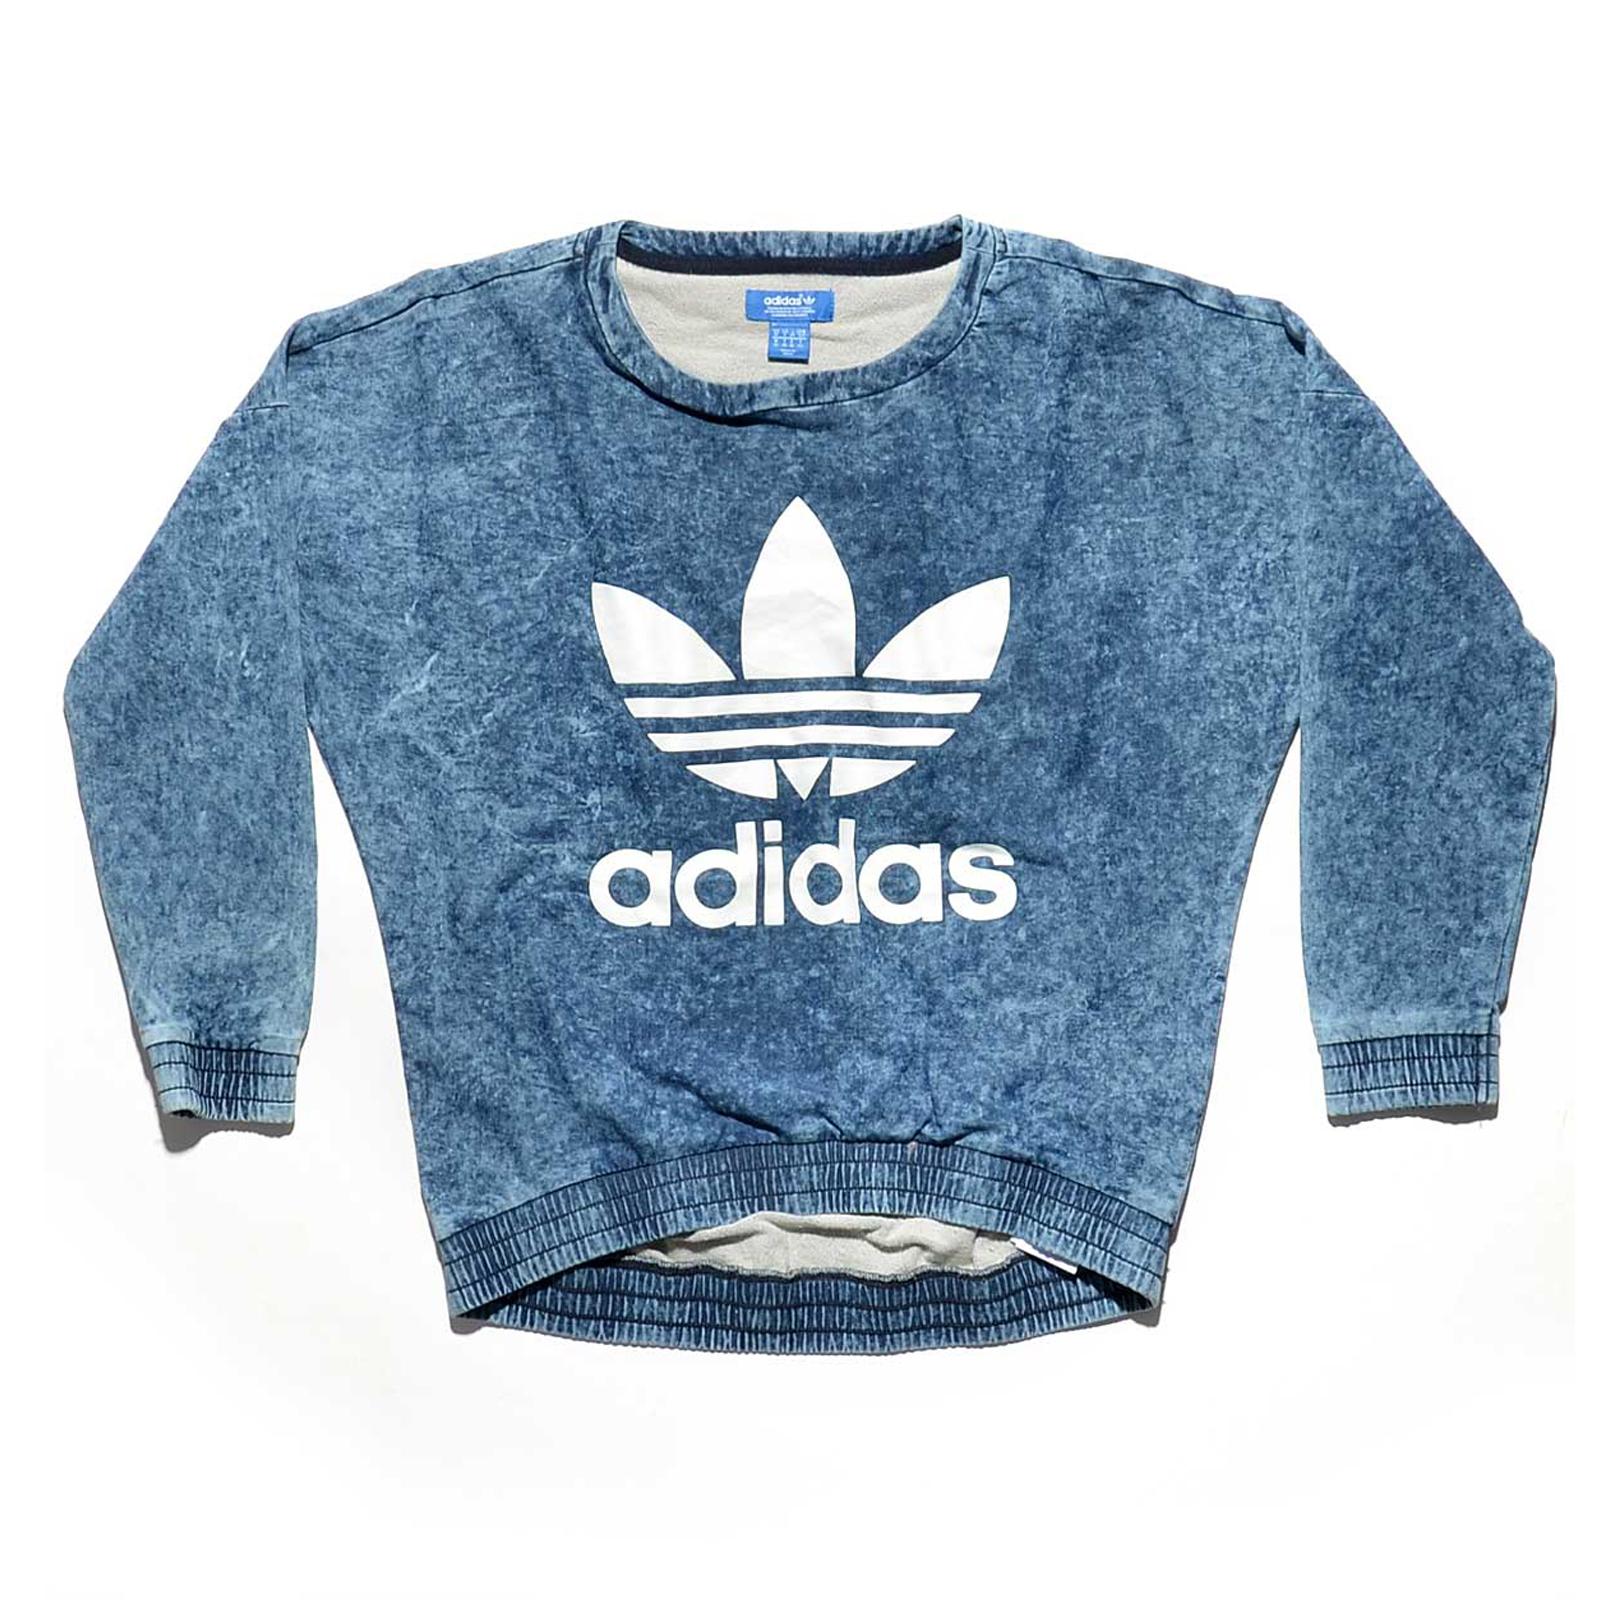 adidas originals womens sweatshirt - Membrane Switch Technologies a2087e693b